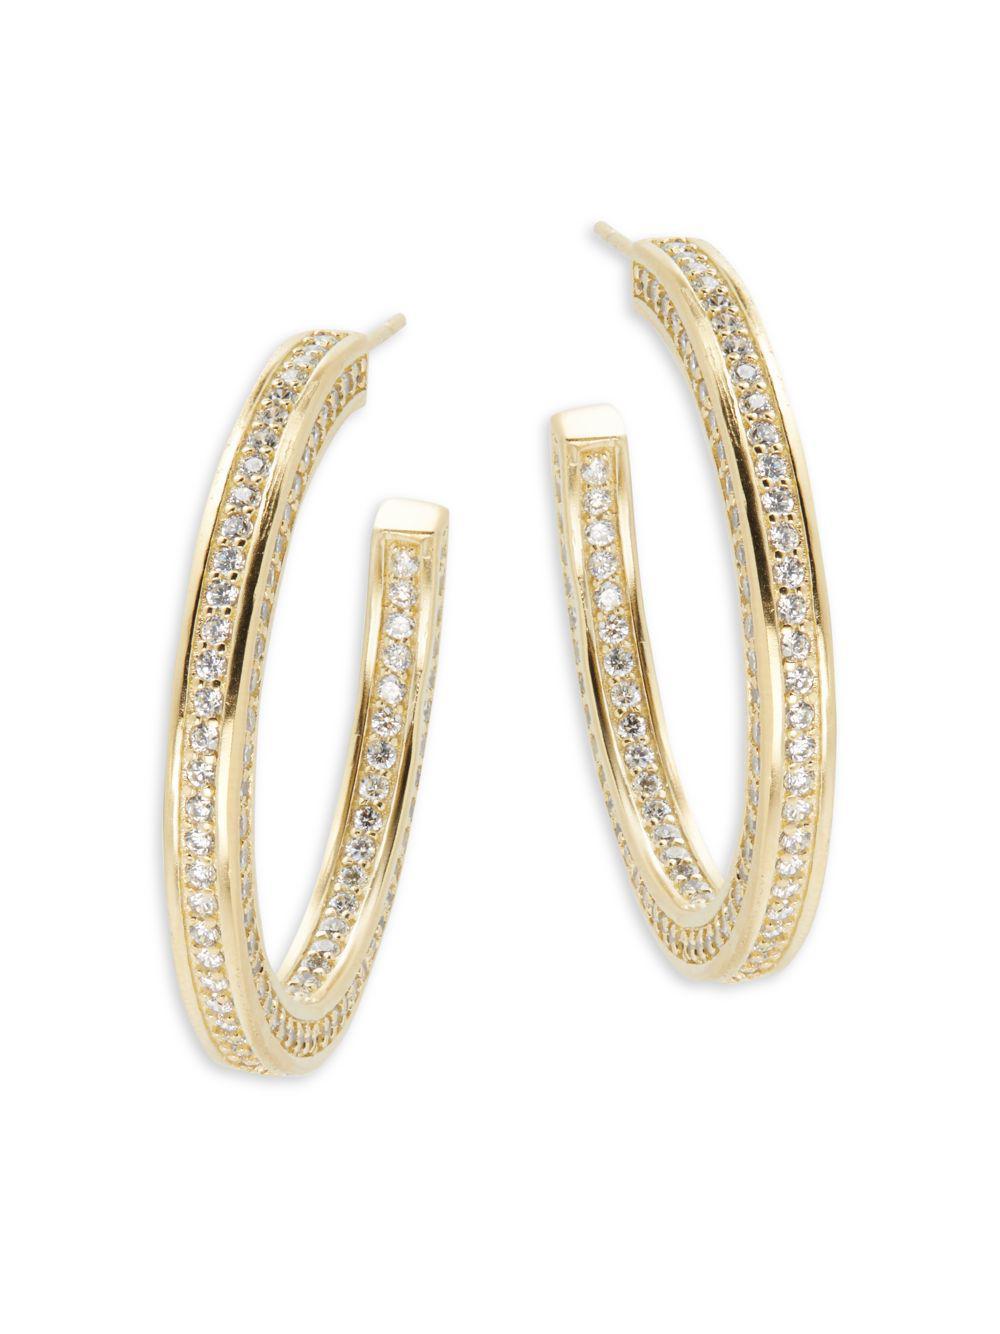 Freida Rothman Women S Metallic Clic Radiance Cubic Zirconia 14k Gold Plated Sterling Silver Hoop Earrings